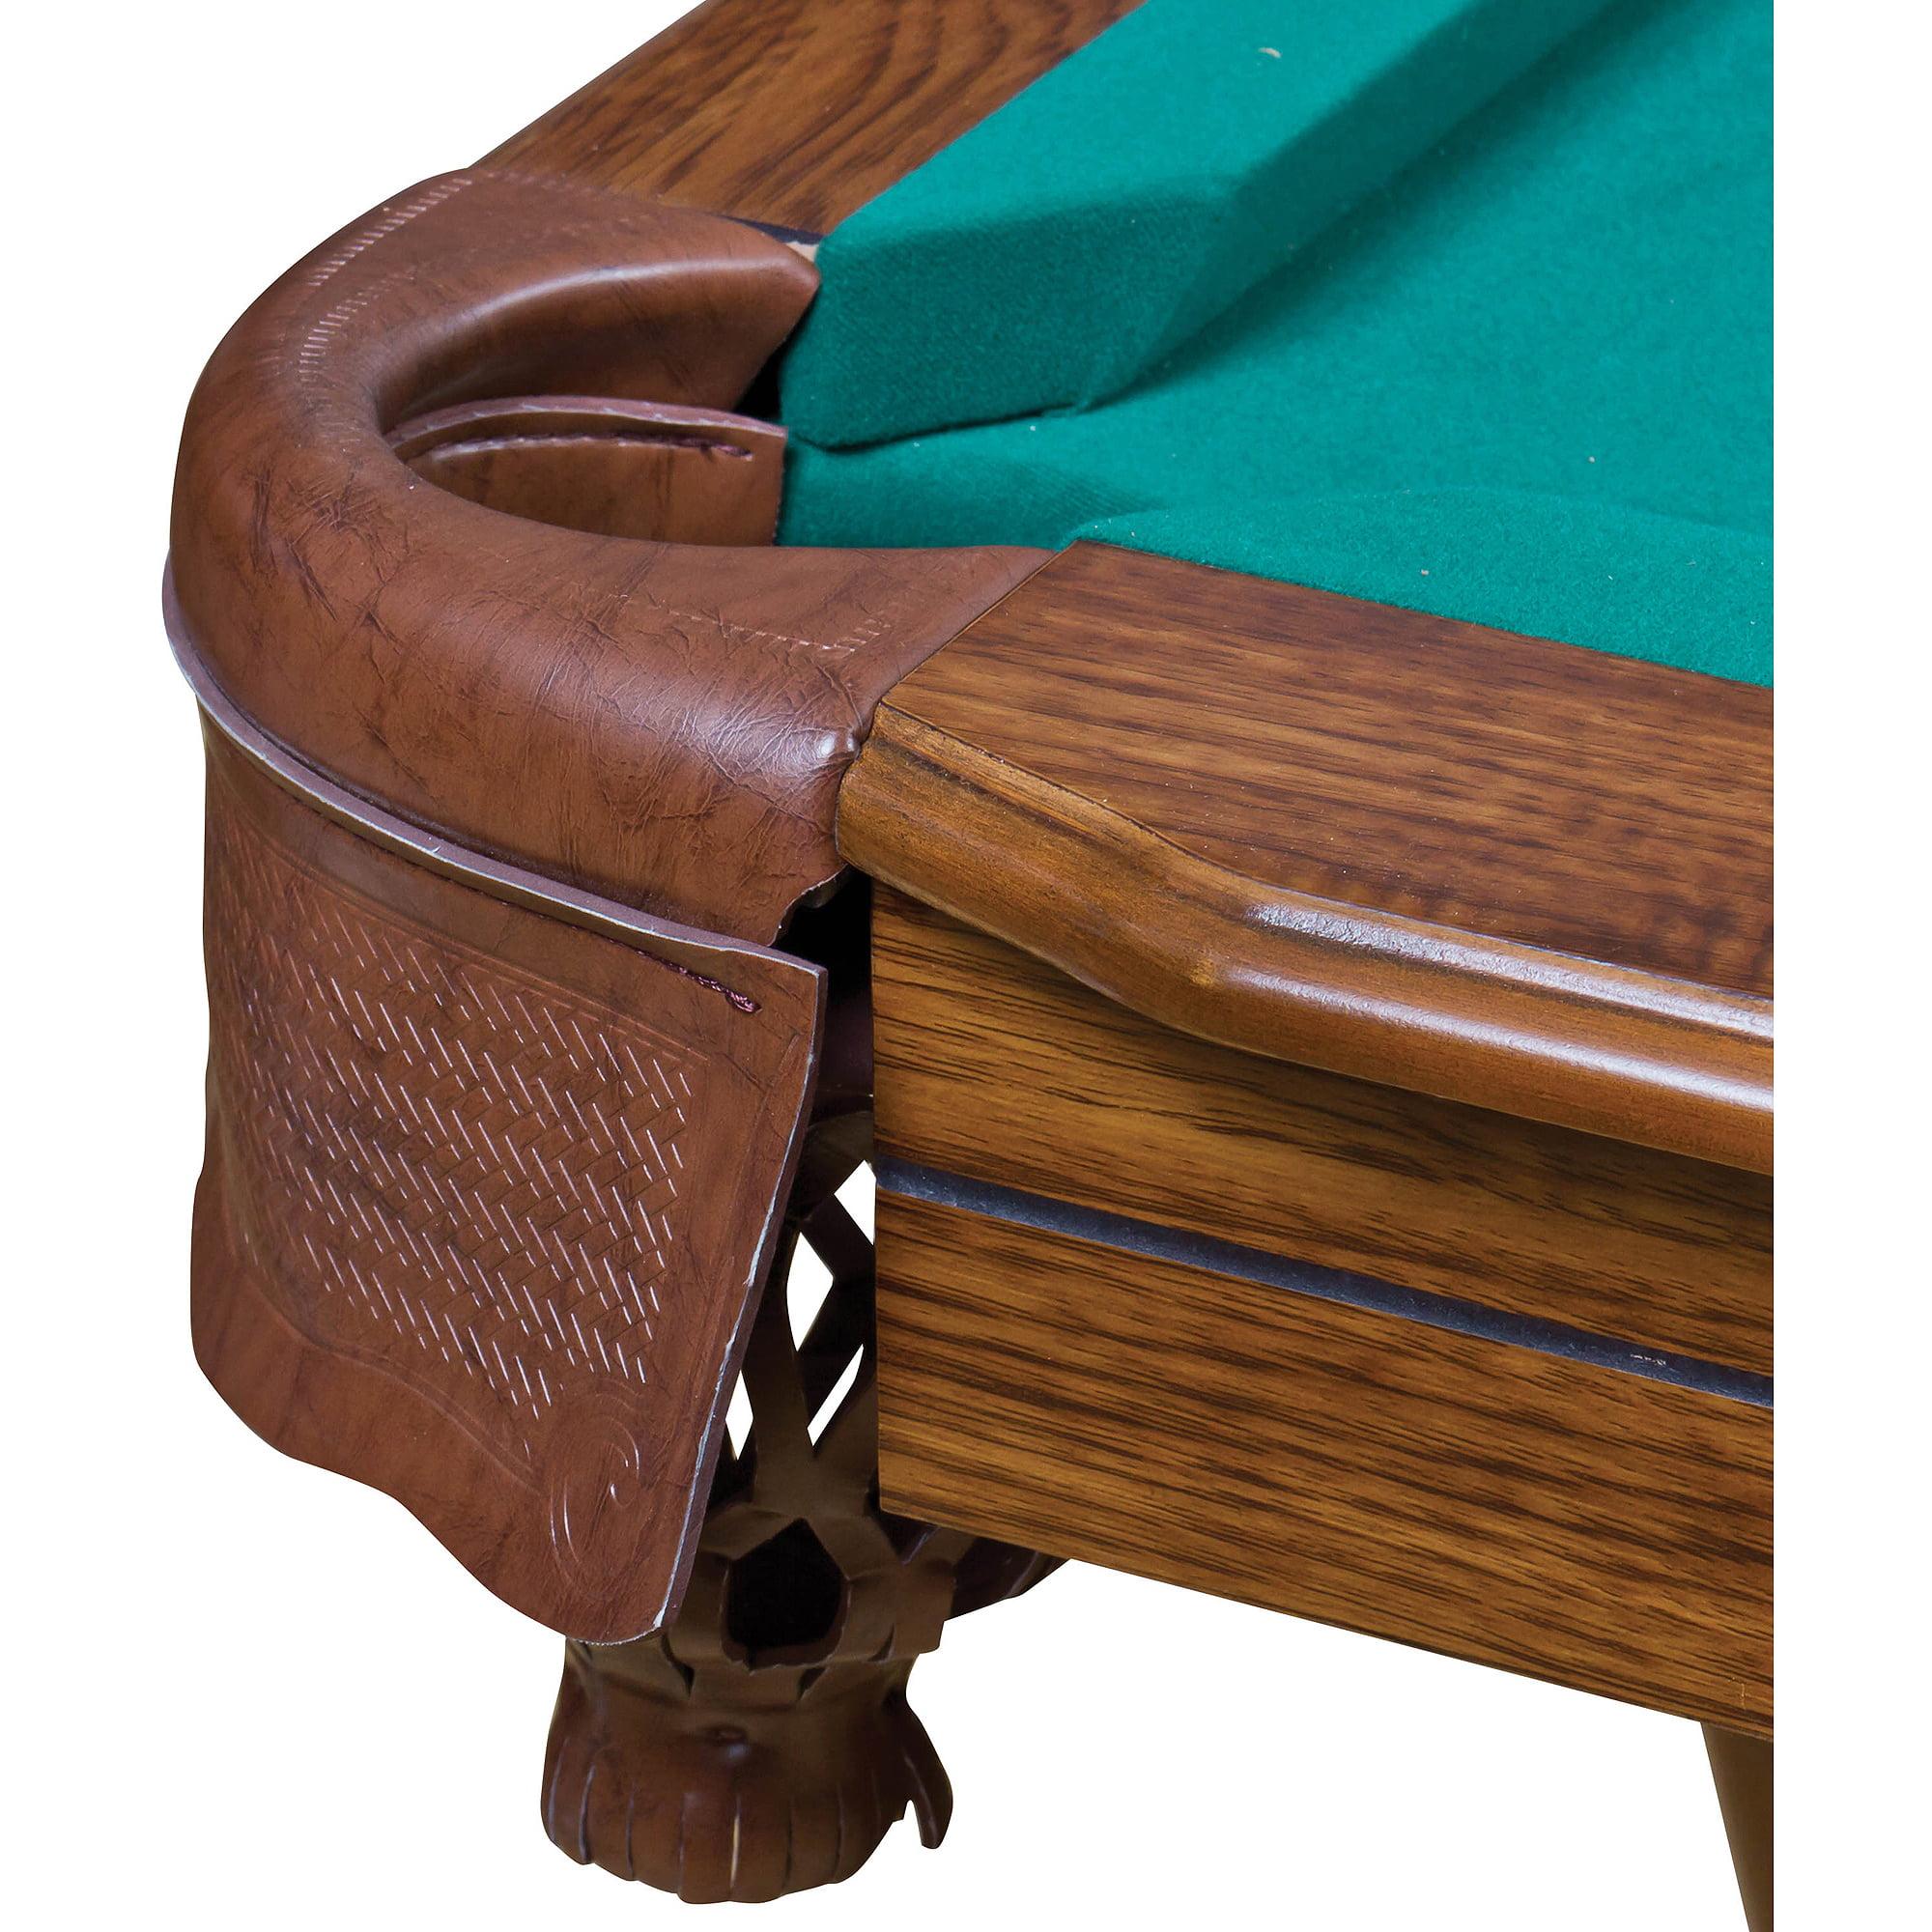 EastPoint Sports 87-inch Brighton Billiard Pool Table